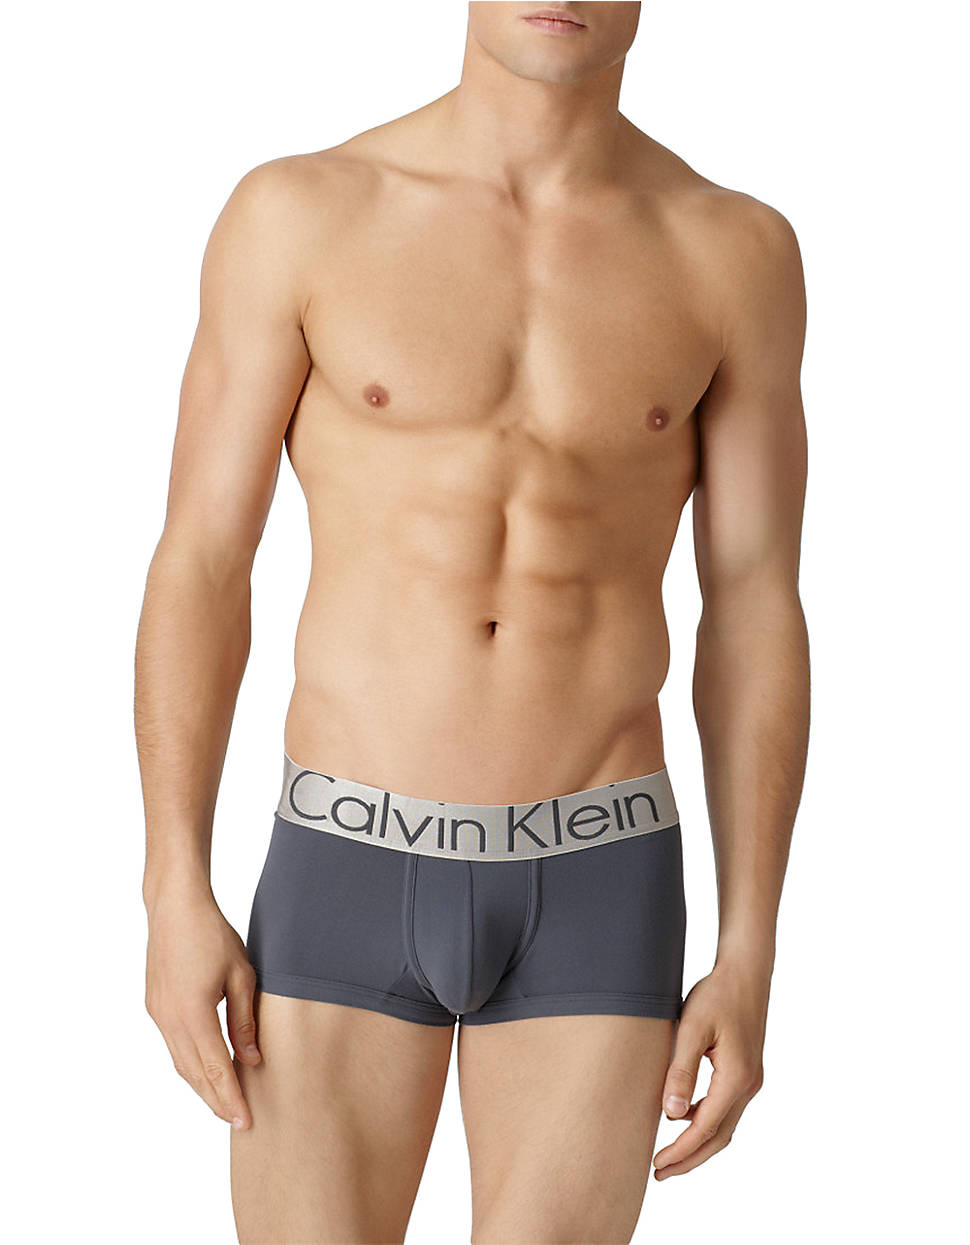 Calvin Klein Steel Microfiber Low Rise Trunk In Gray For Men Lyst Brief Original Gallery